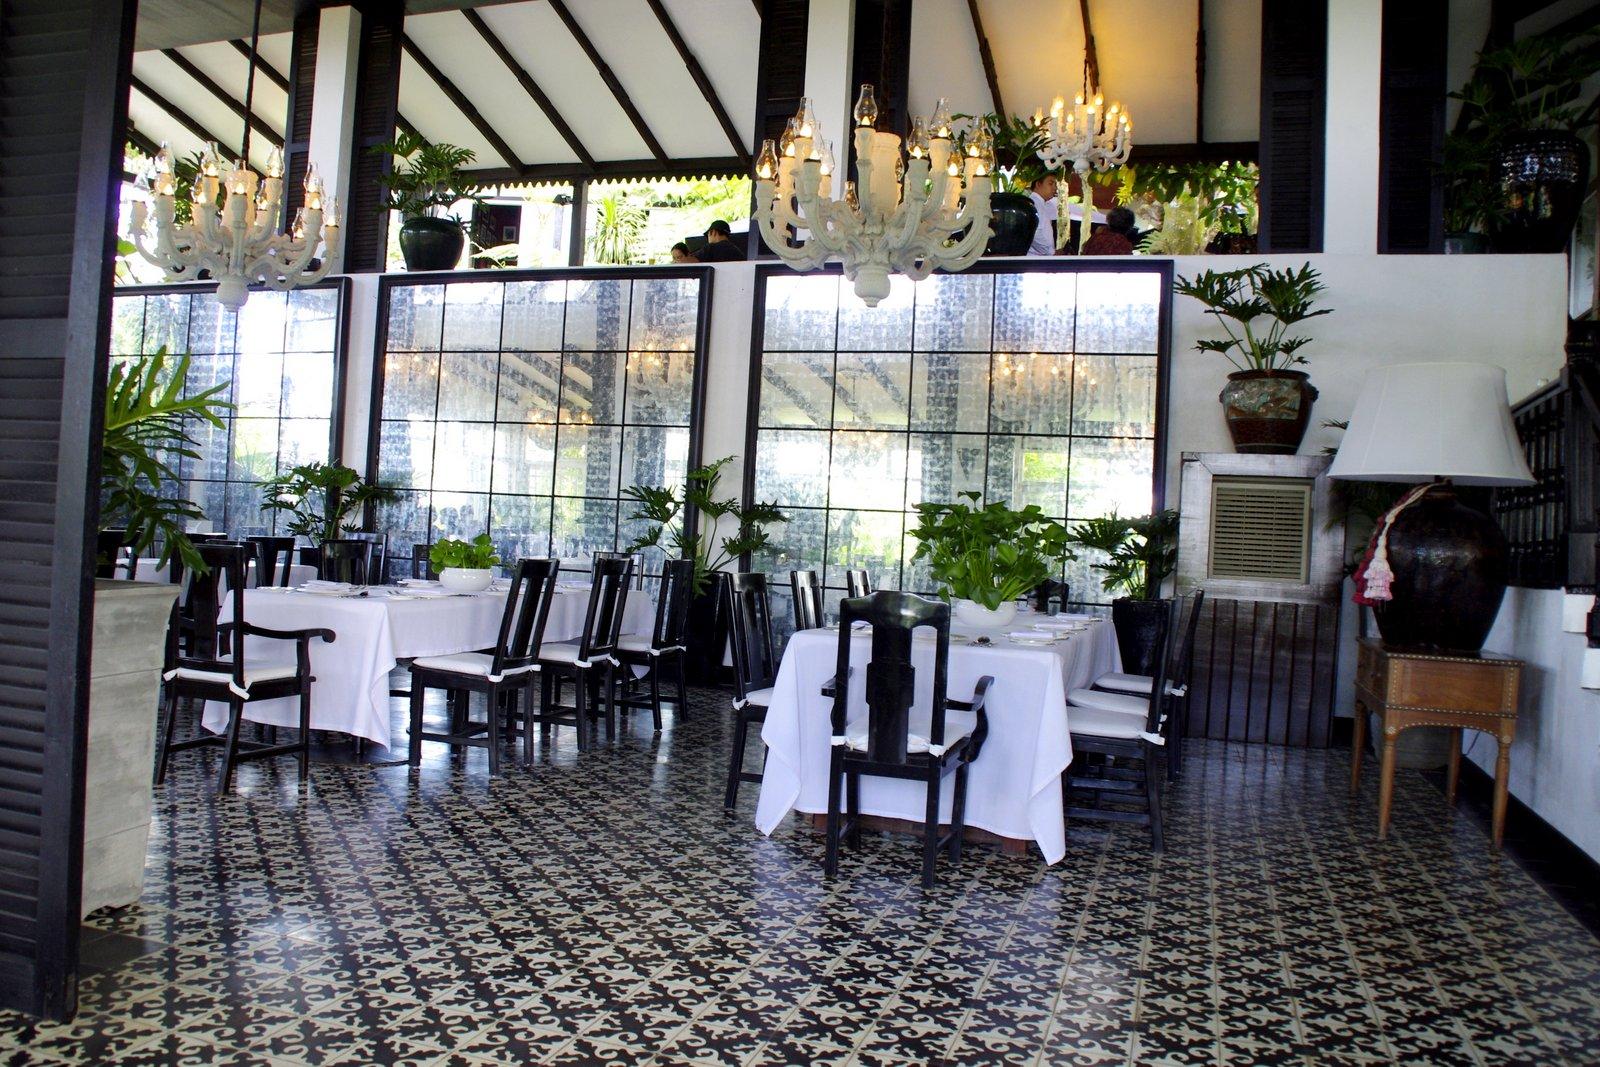 Tagaytay lunch at antonio 39 s edmund macaso for Antonio s italian cuisine